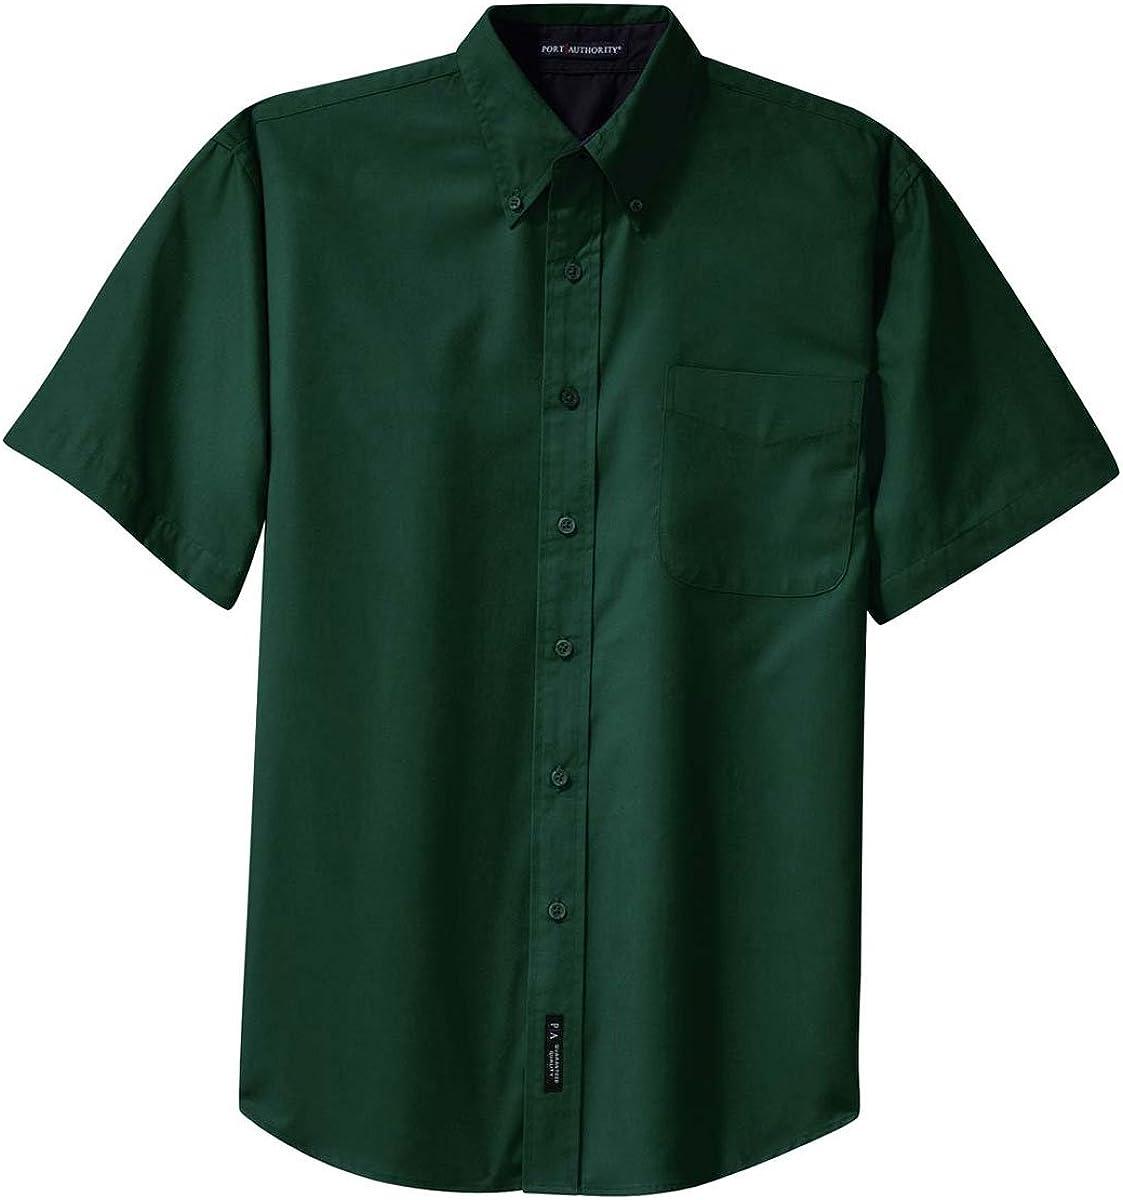 Port Authority Men's Big Short-Sleeve Easy Care Dress Shirt-Dark Green/Navy S508